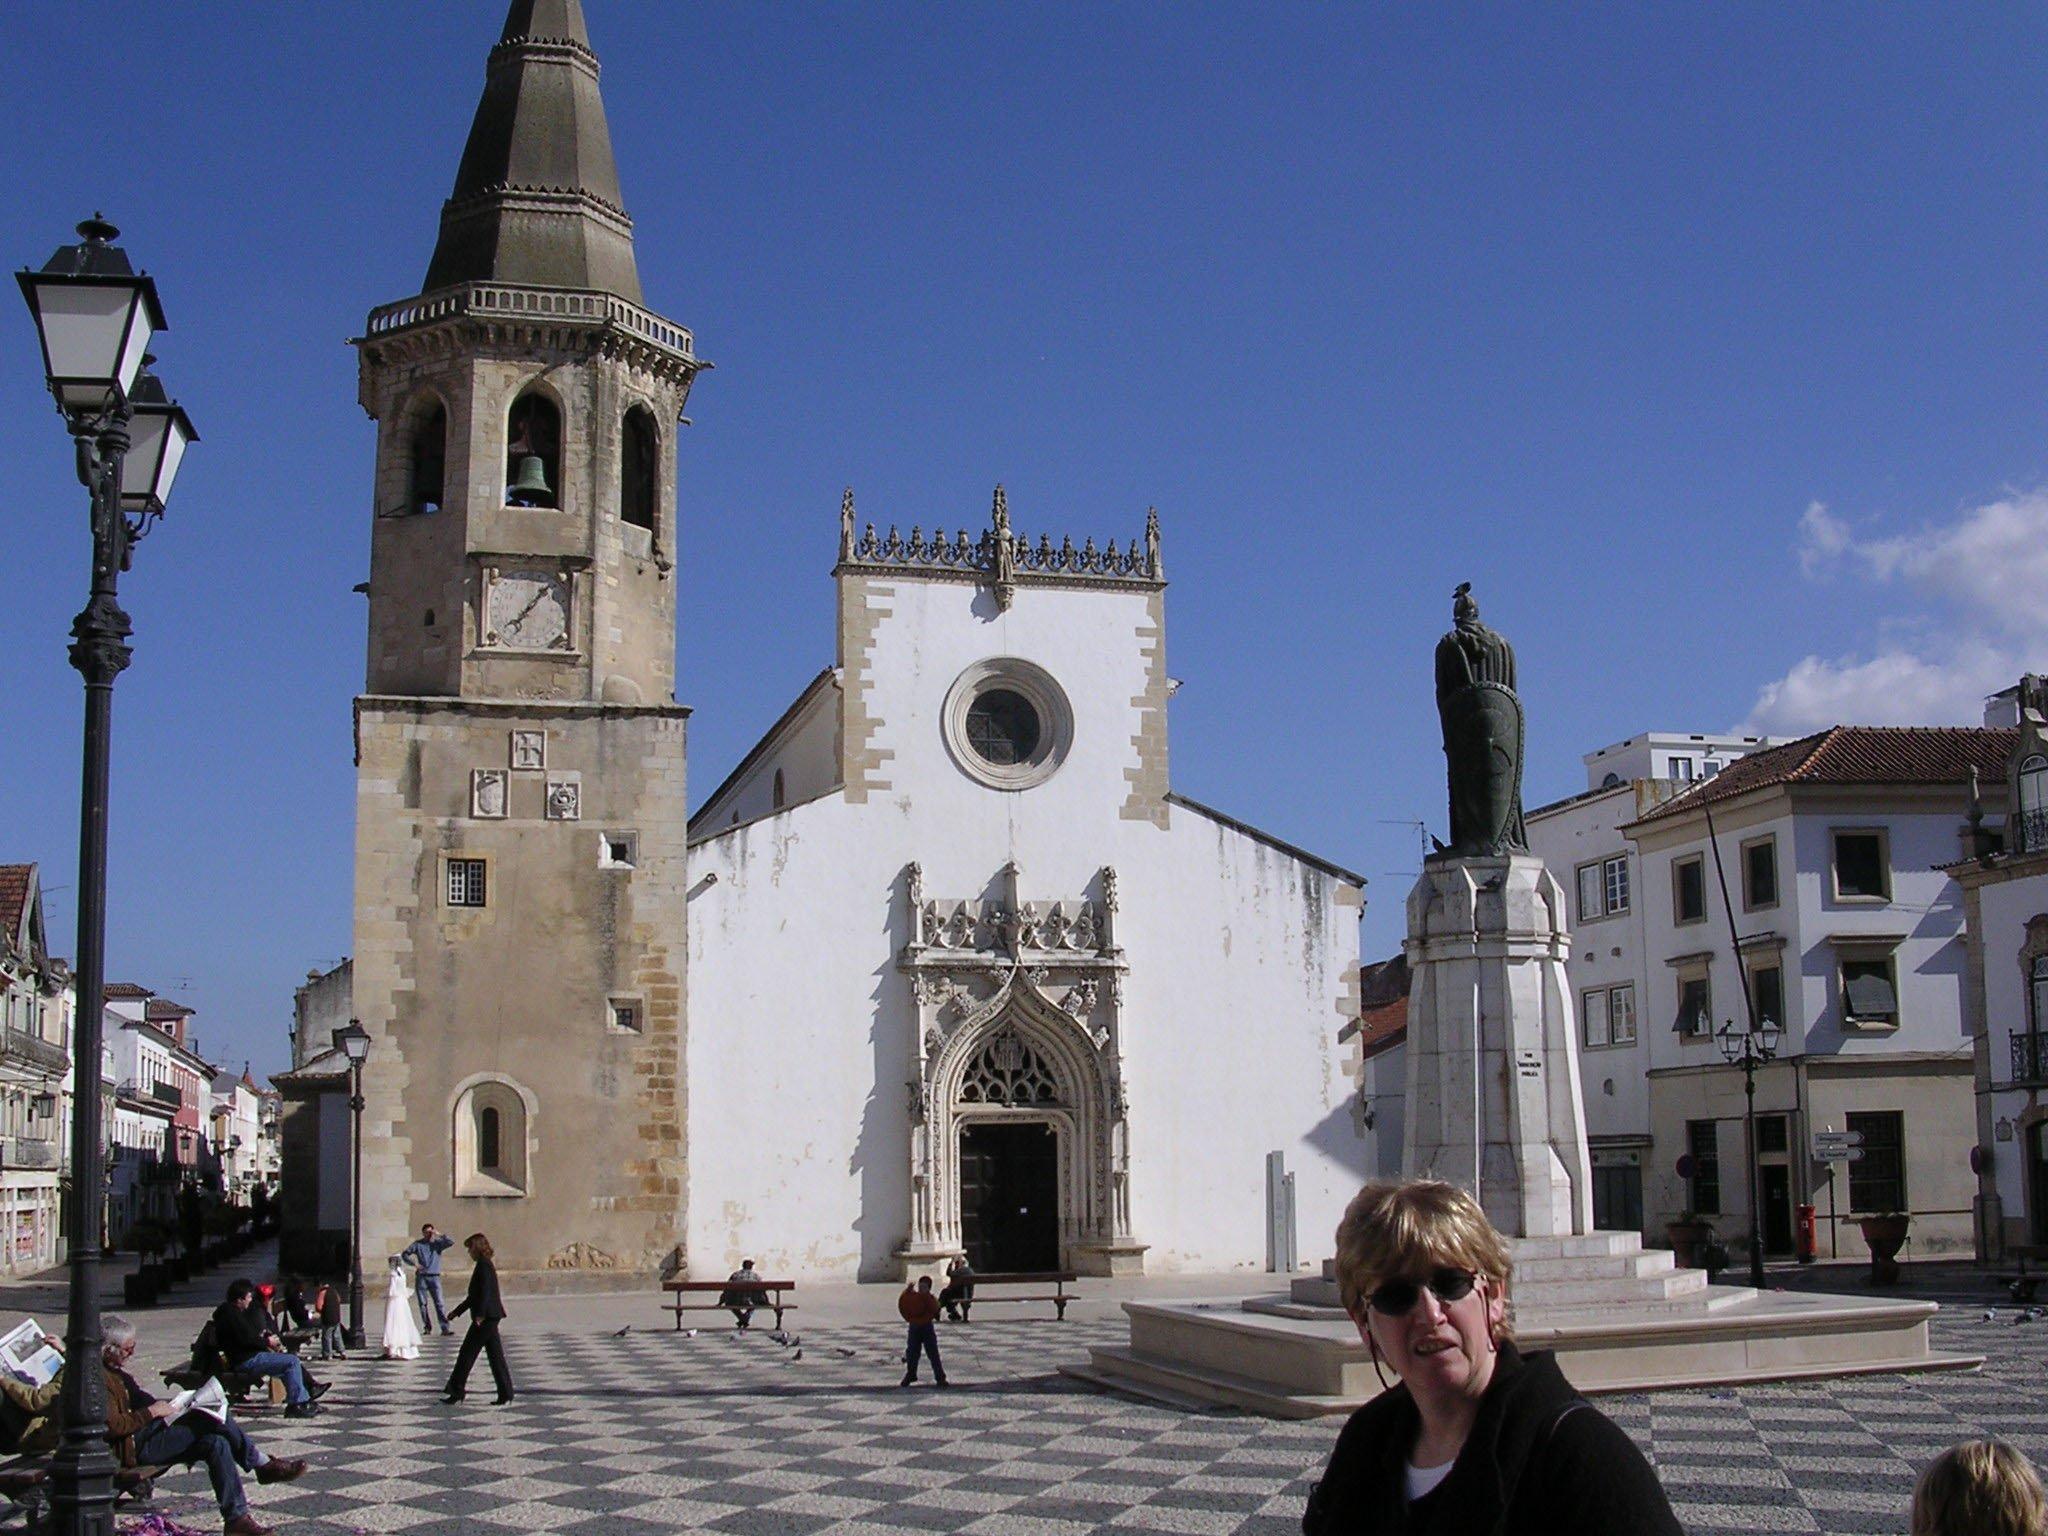 церковь святого жоржа баптисто